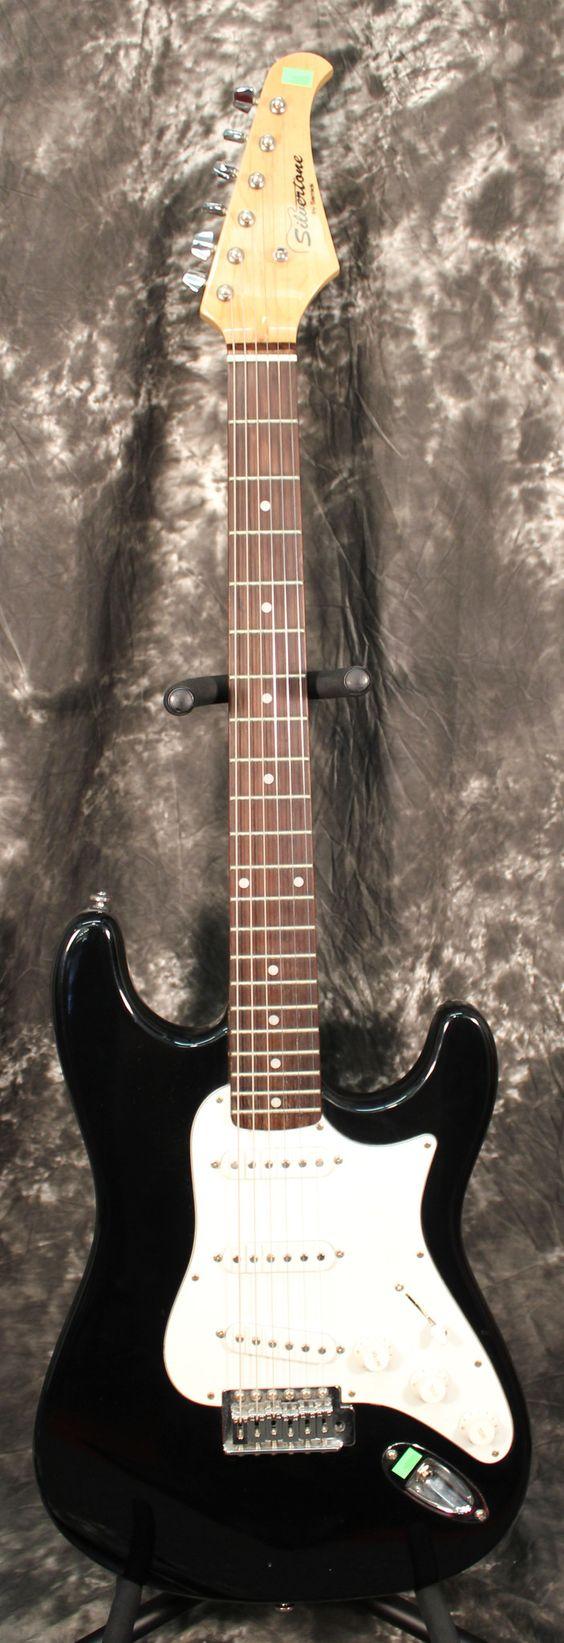 Silvertone by Samick Strat Style Electric Guitar Black